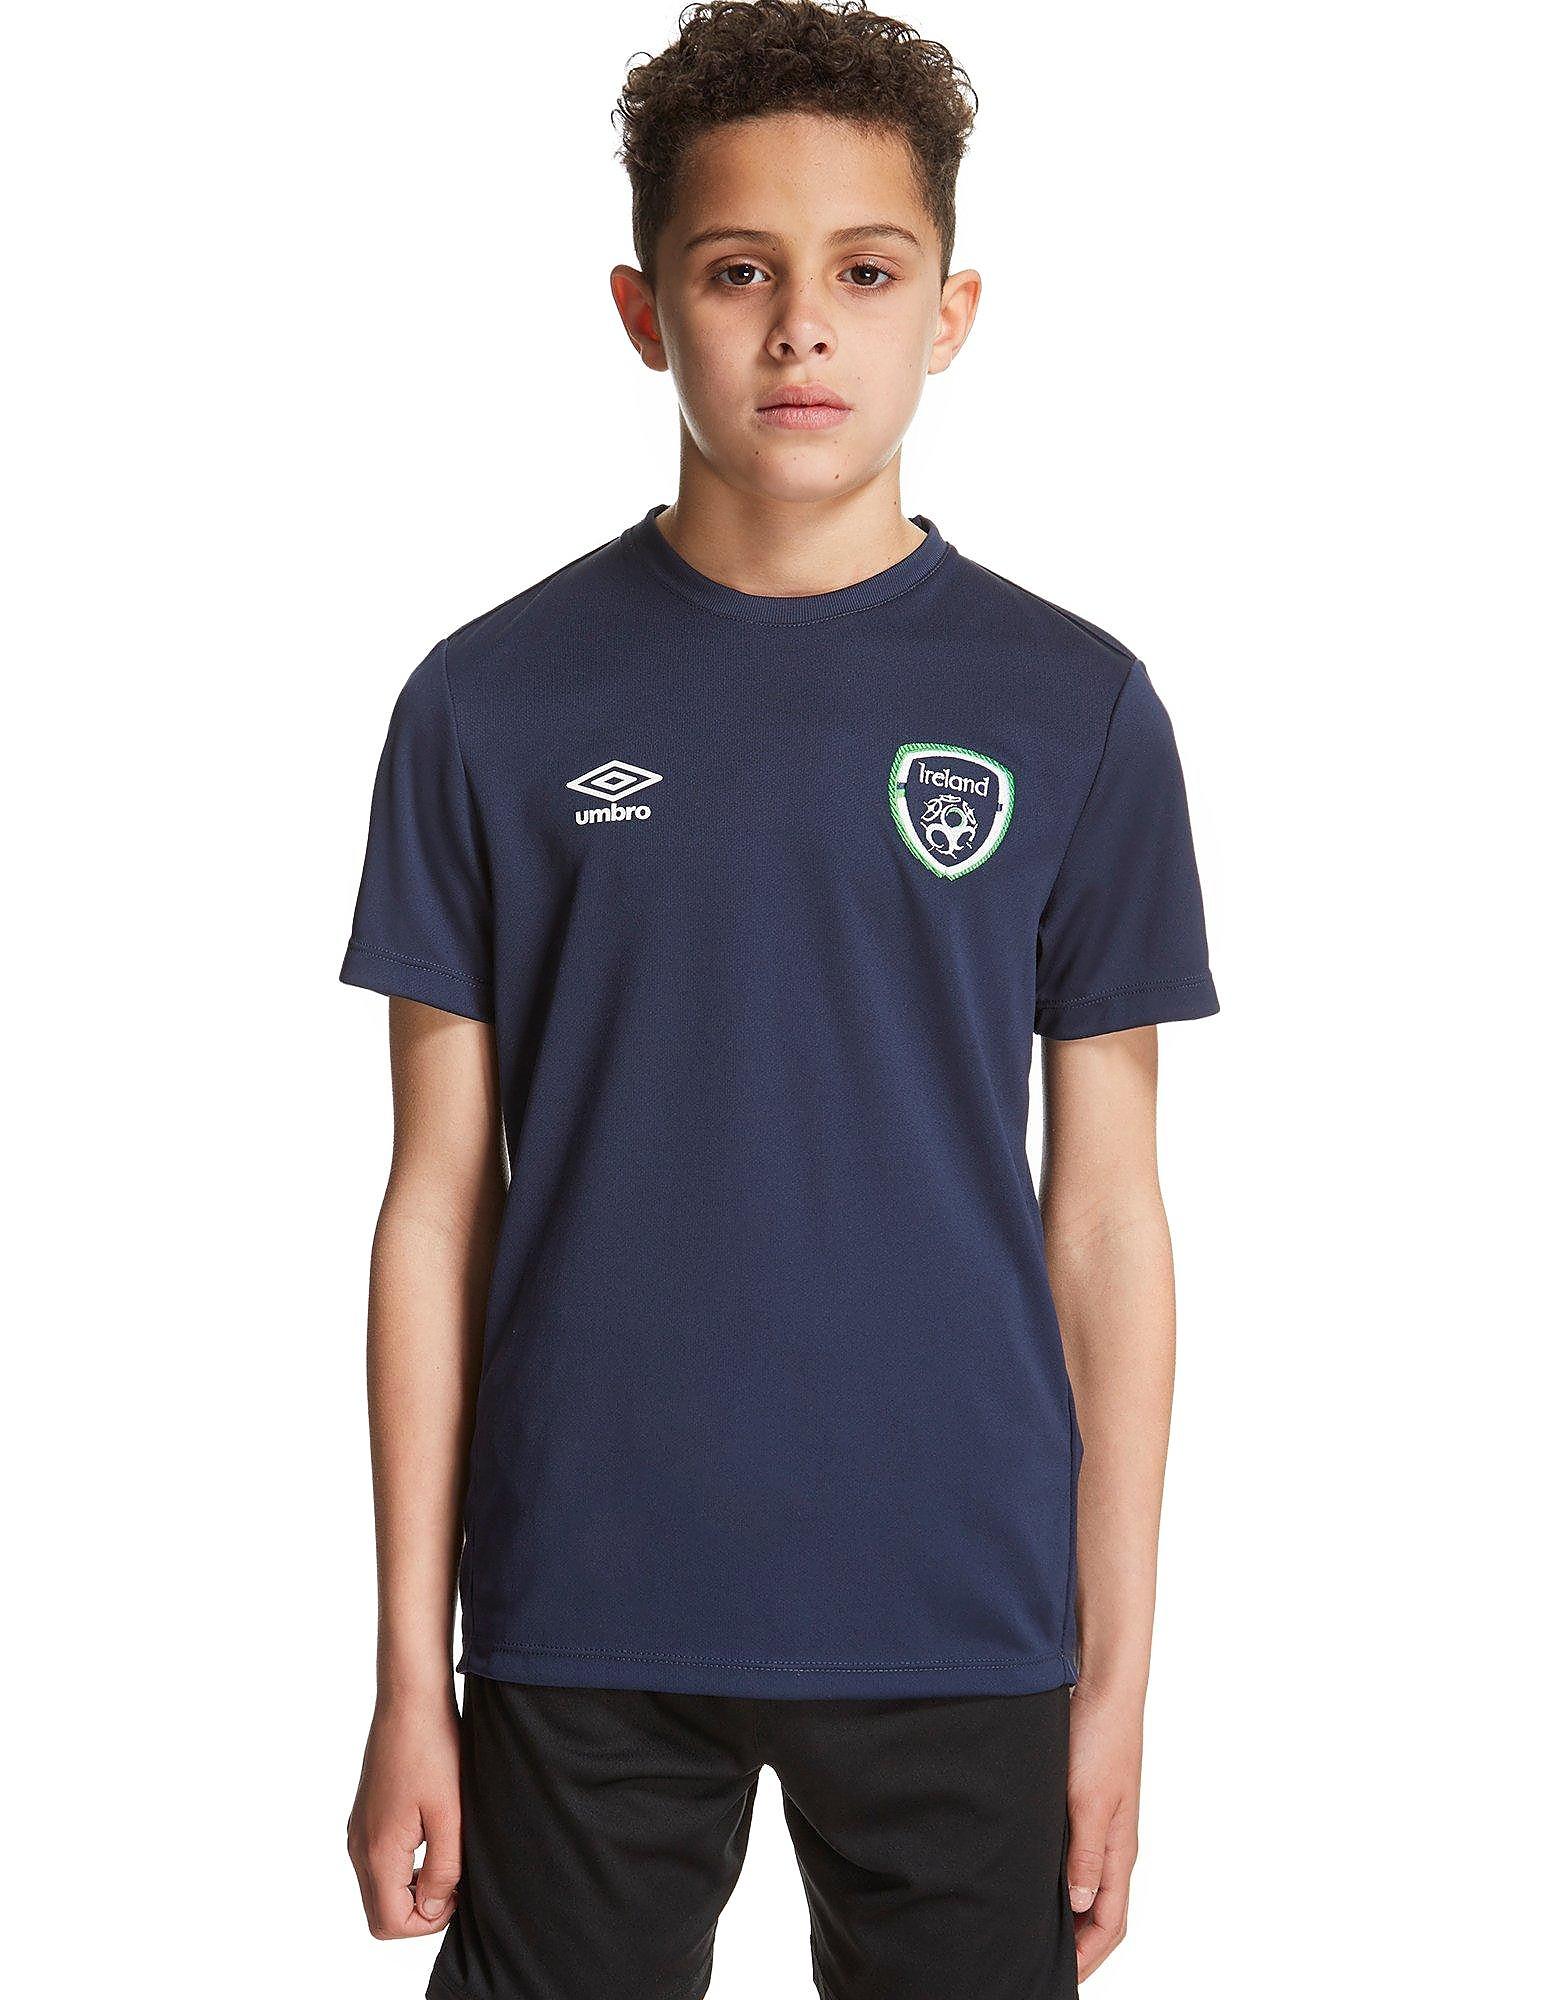 Umbro Republic of Ireland Bench Shirt Junior